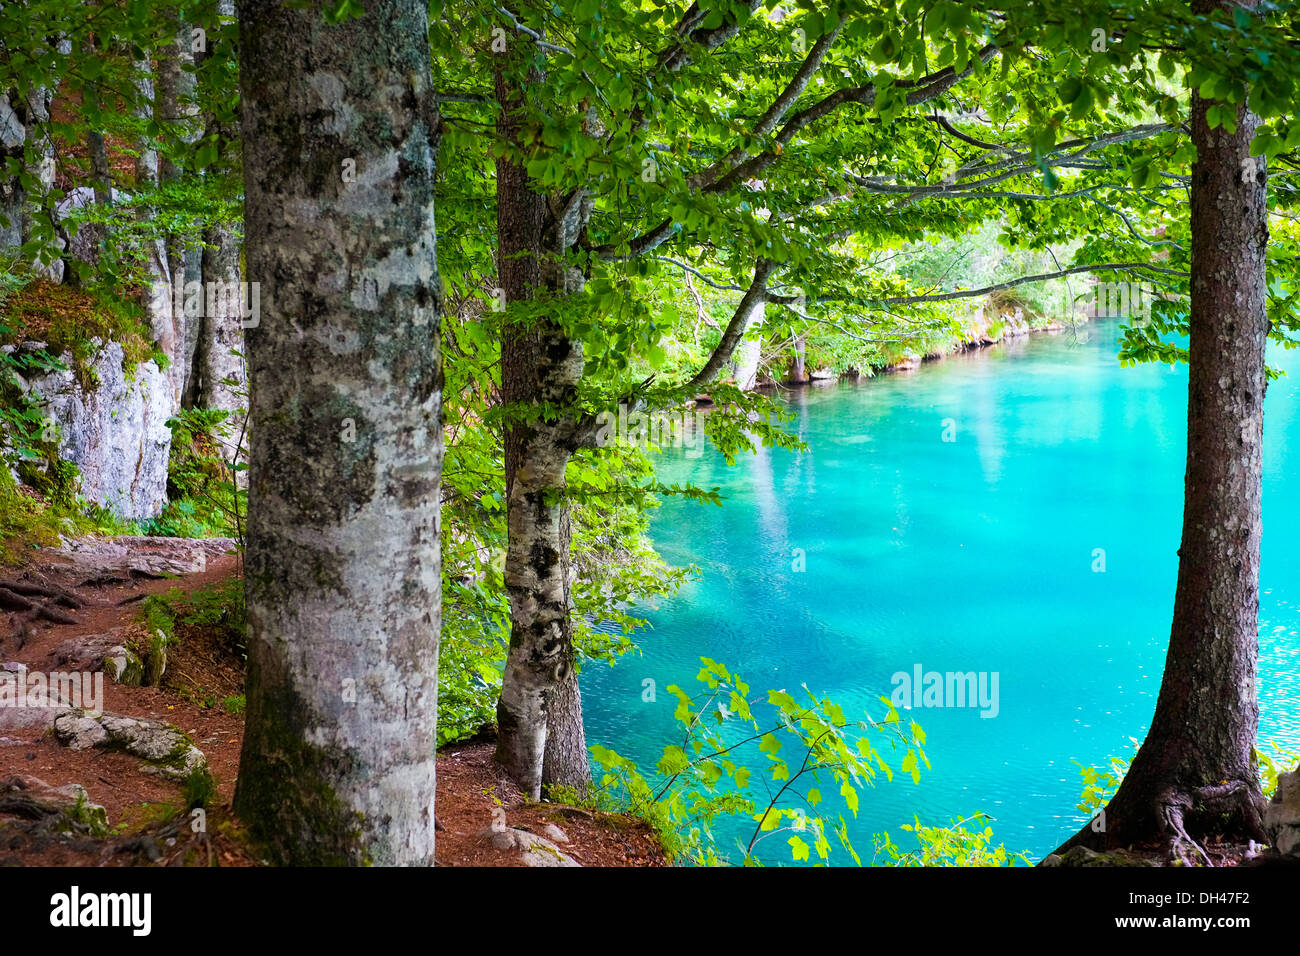 Blue transparent water of Fusine mountain lake, Friuli, Italy - Stock Image